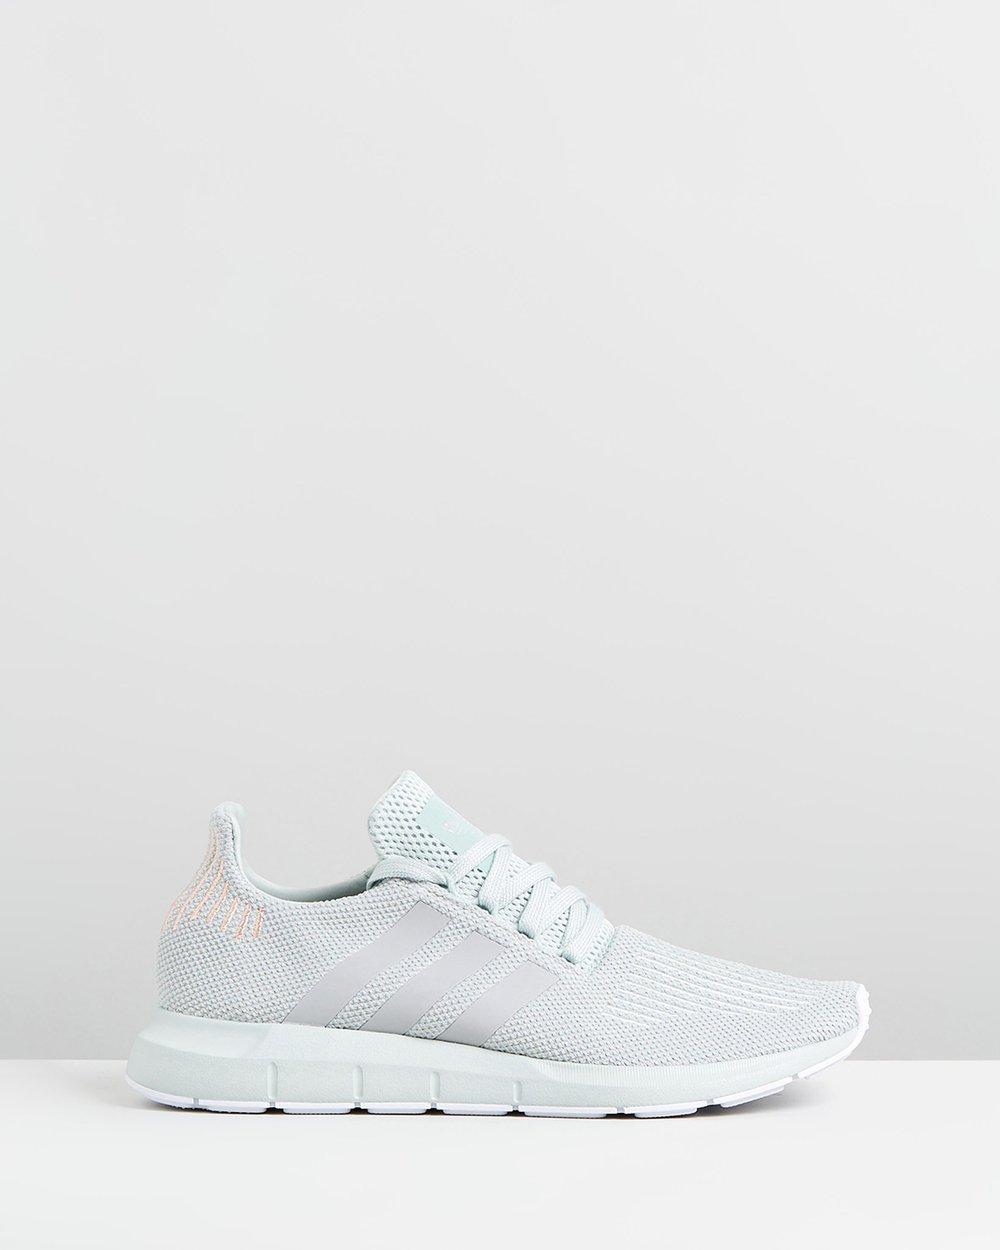 new concept 9d515 35804 Swift Run - Women's by adidas Originals Online | THE ICONIC | Australia